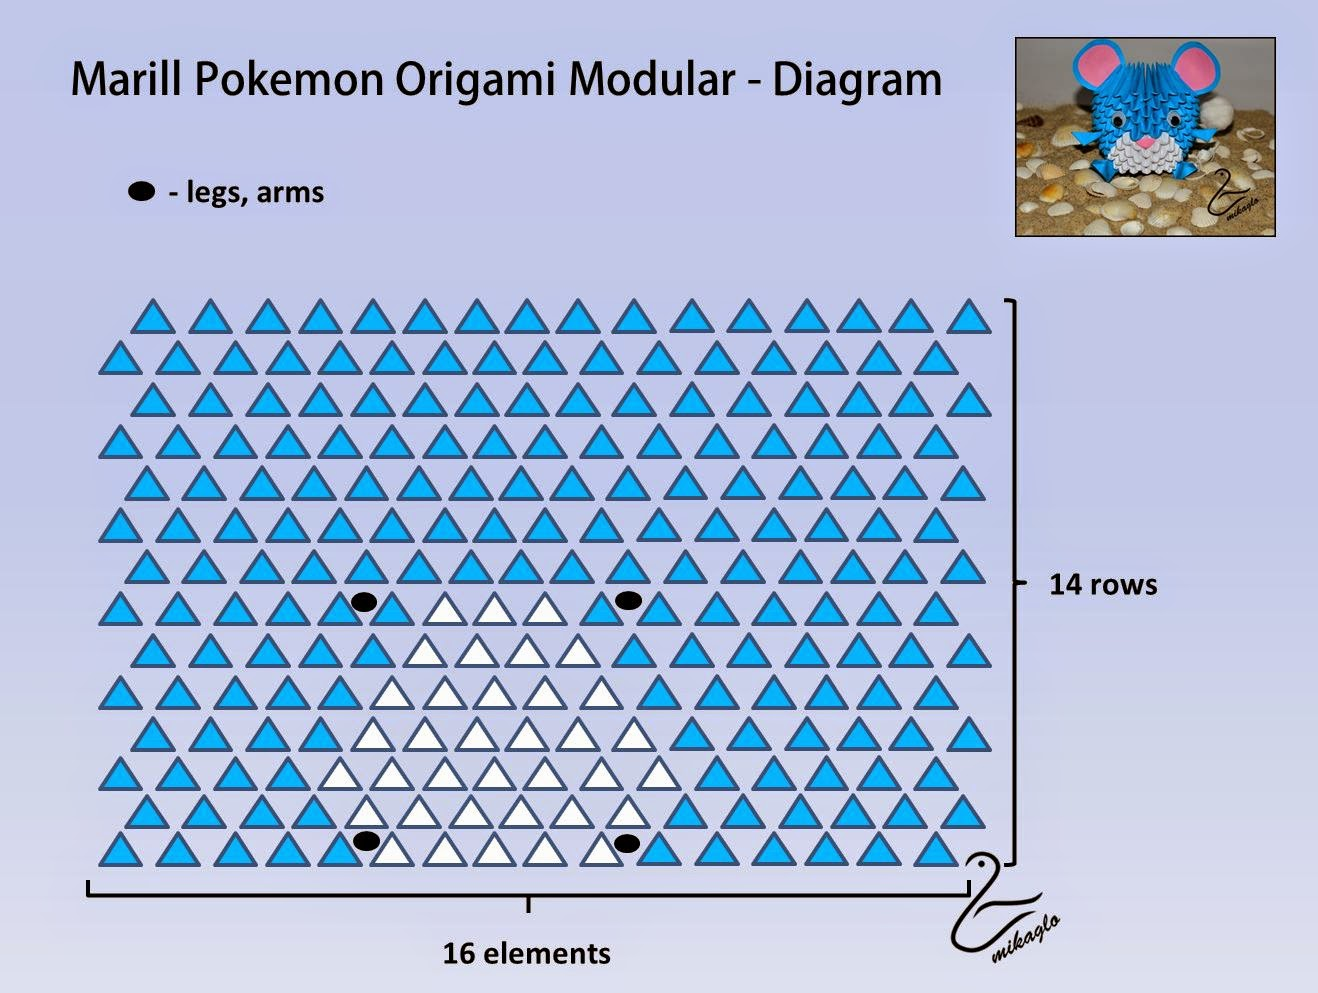 Origami Pokemon Diagram Automotive Wiring Diagrams Explained 3d Mikaglo 31 Marill Z Krok Po